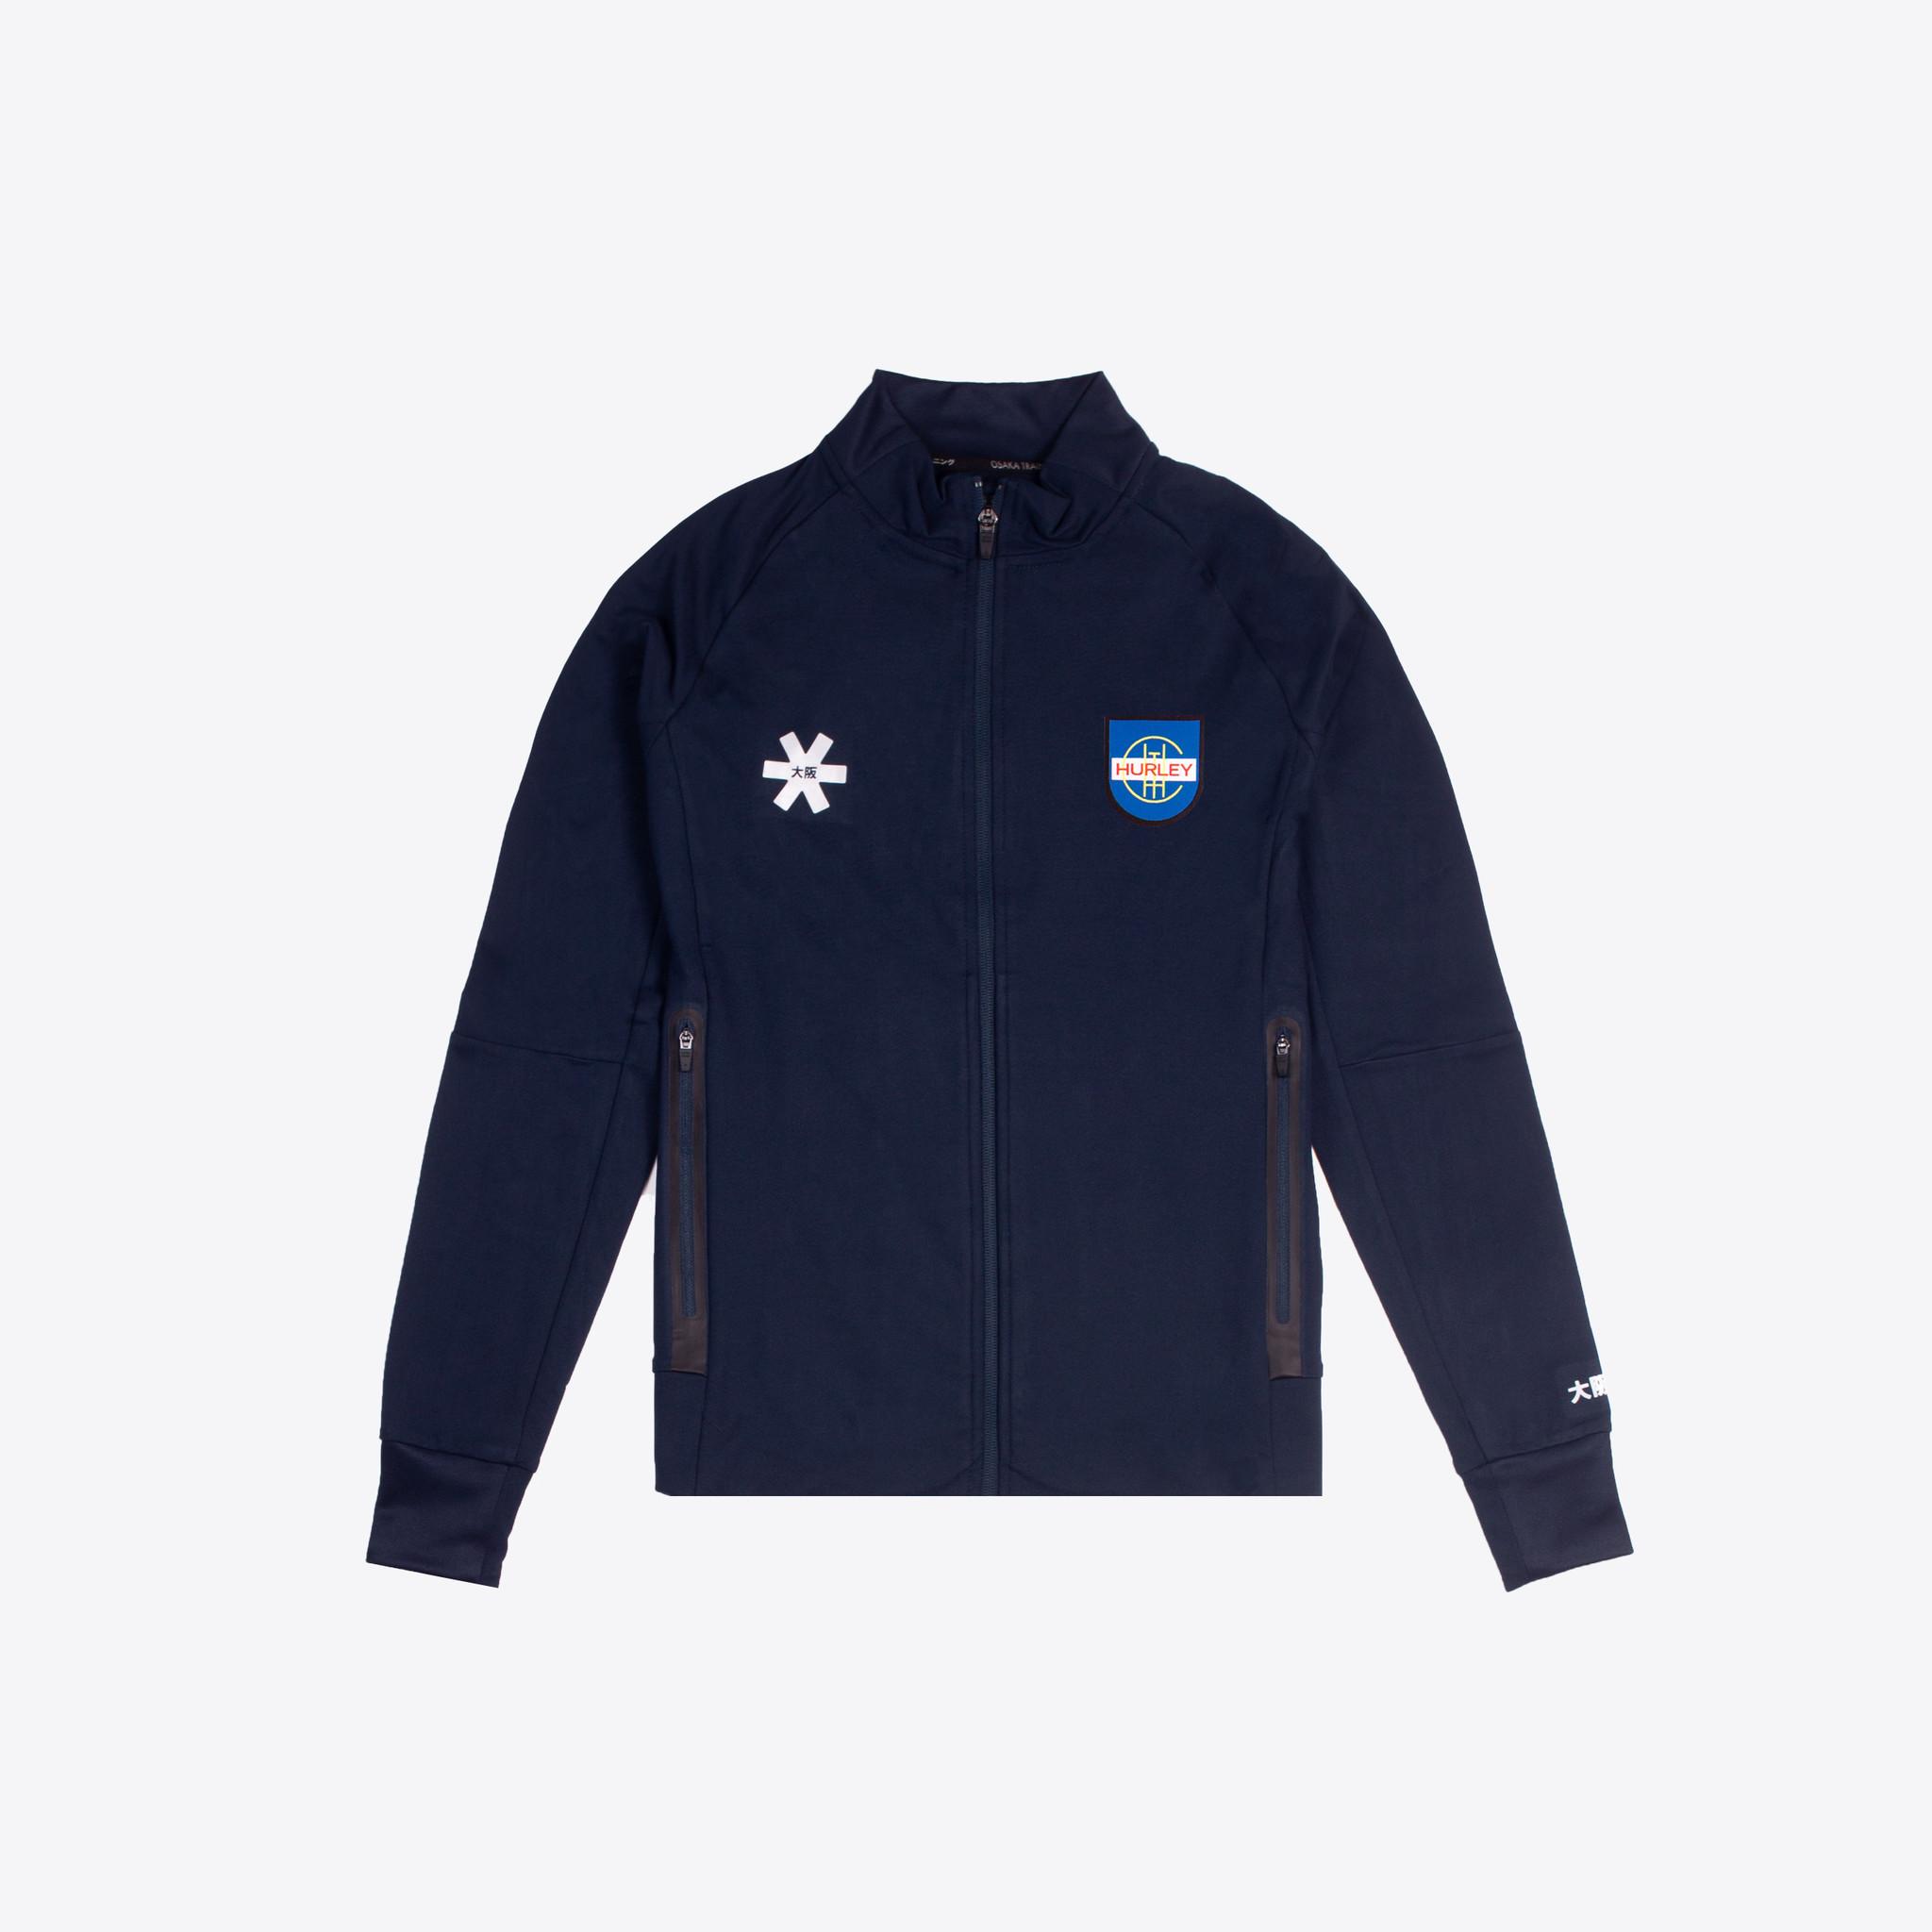 Hurley track jacket Women